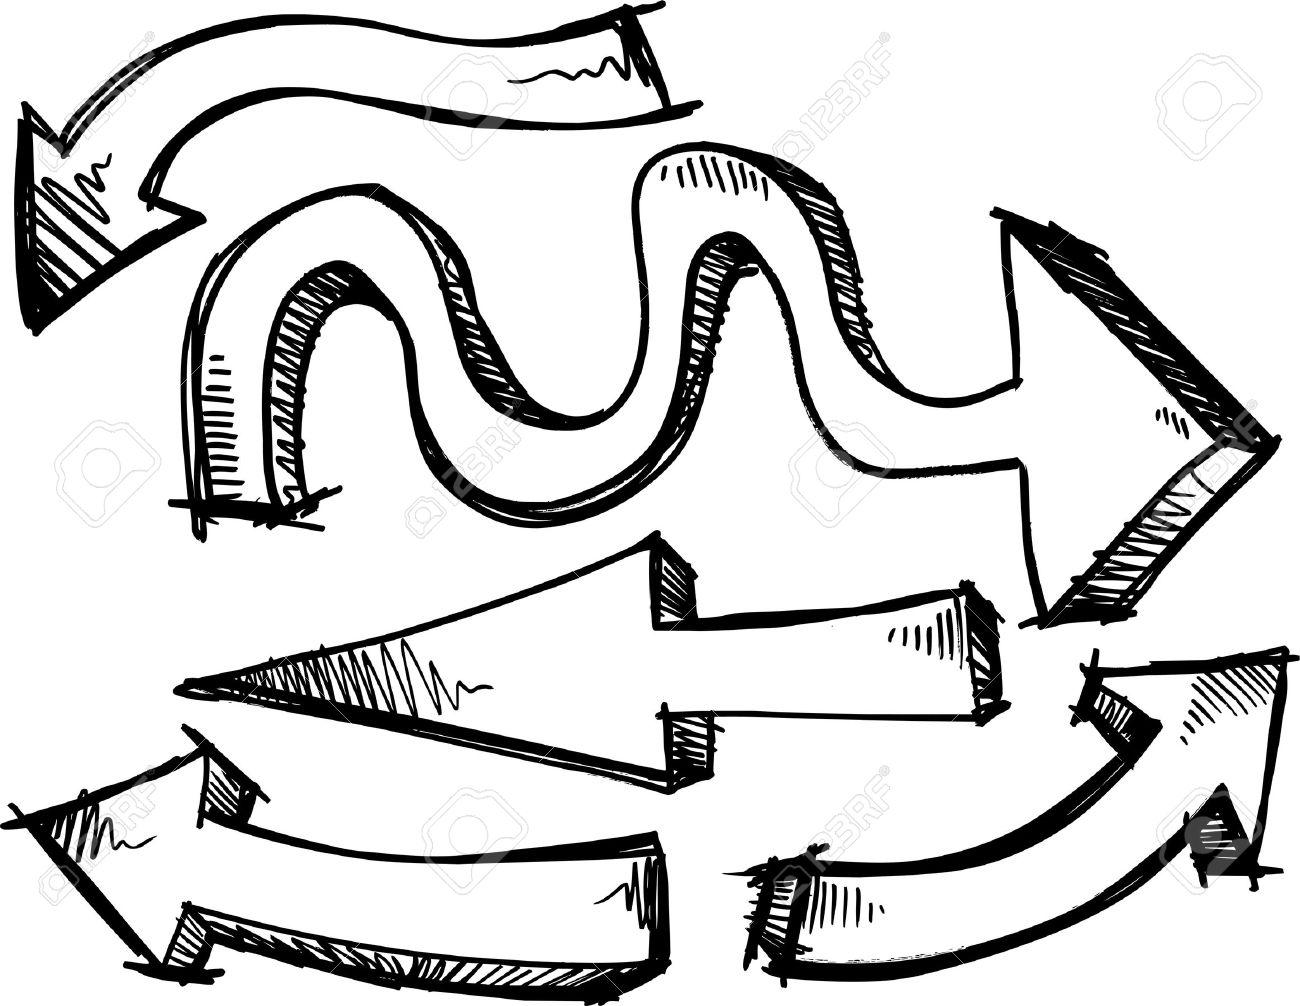 Sketchy Doodle Arrows Illustration - 6799669